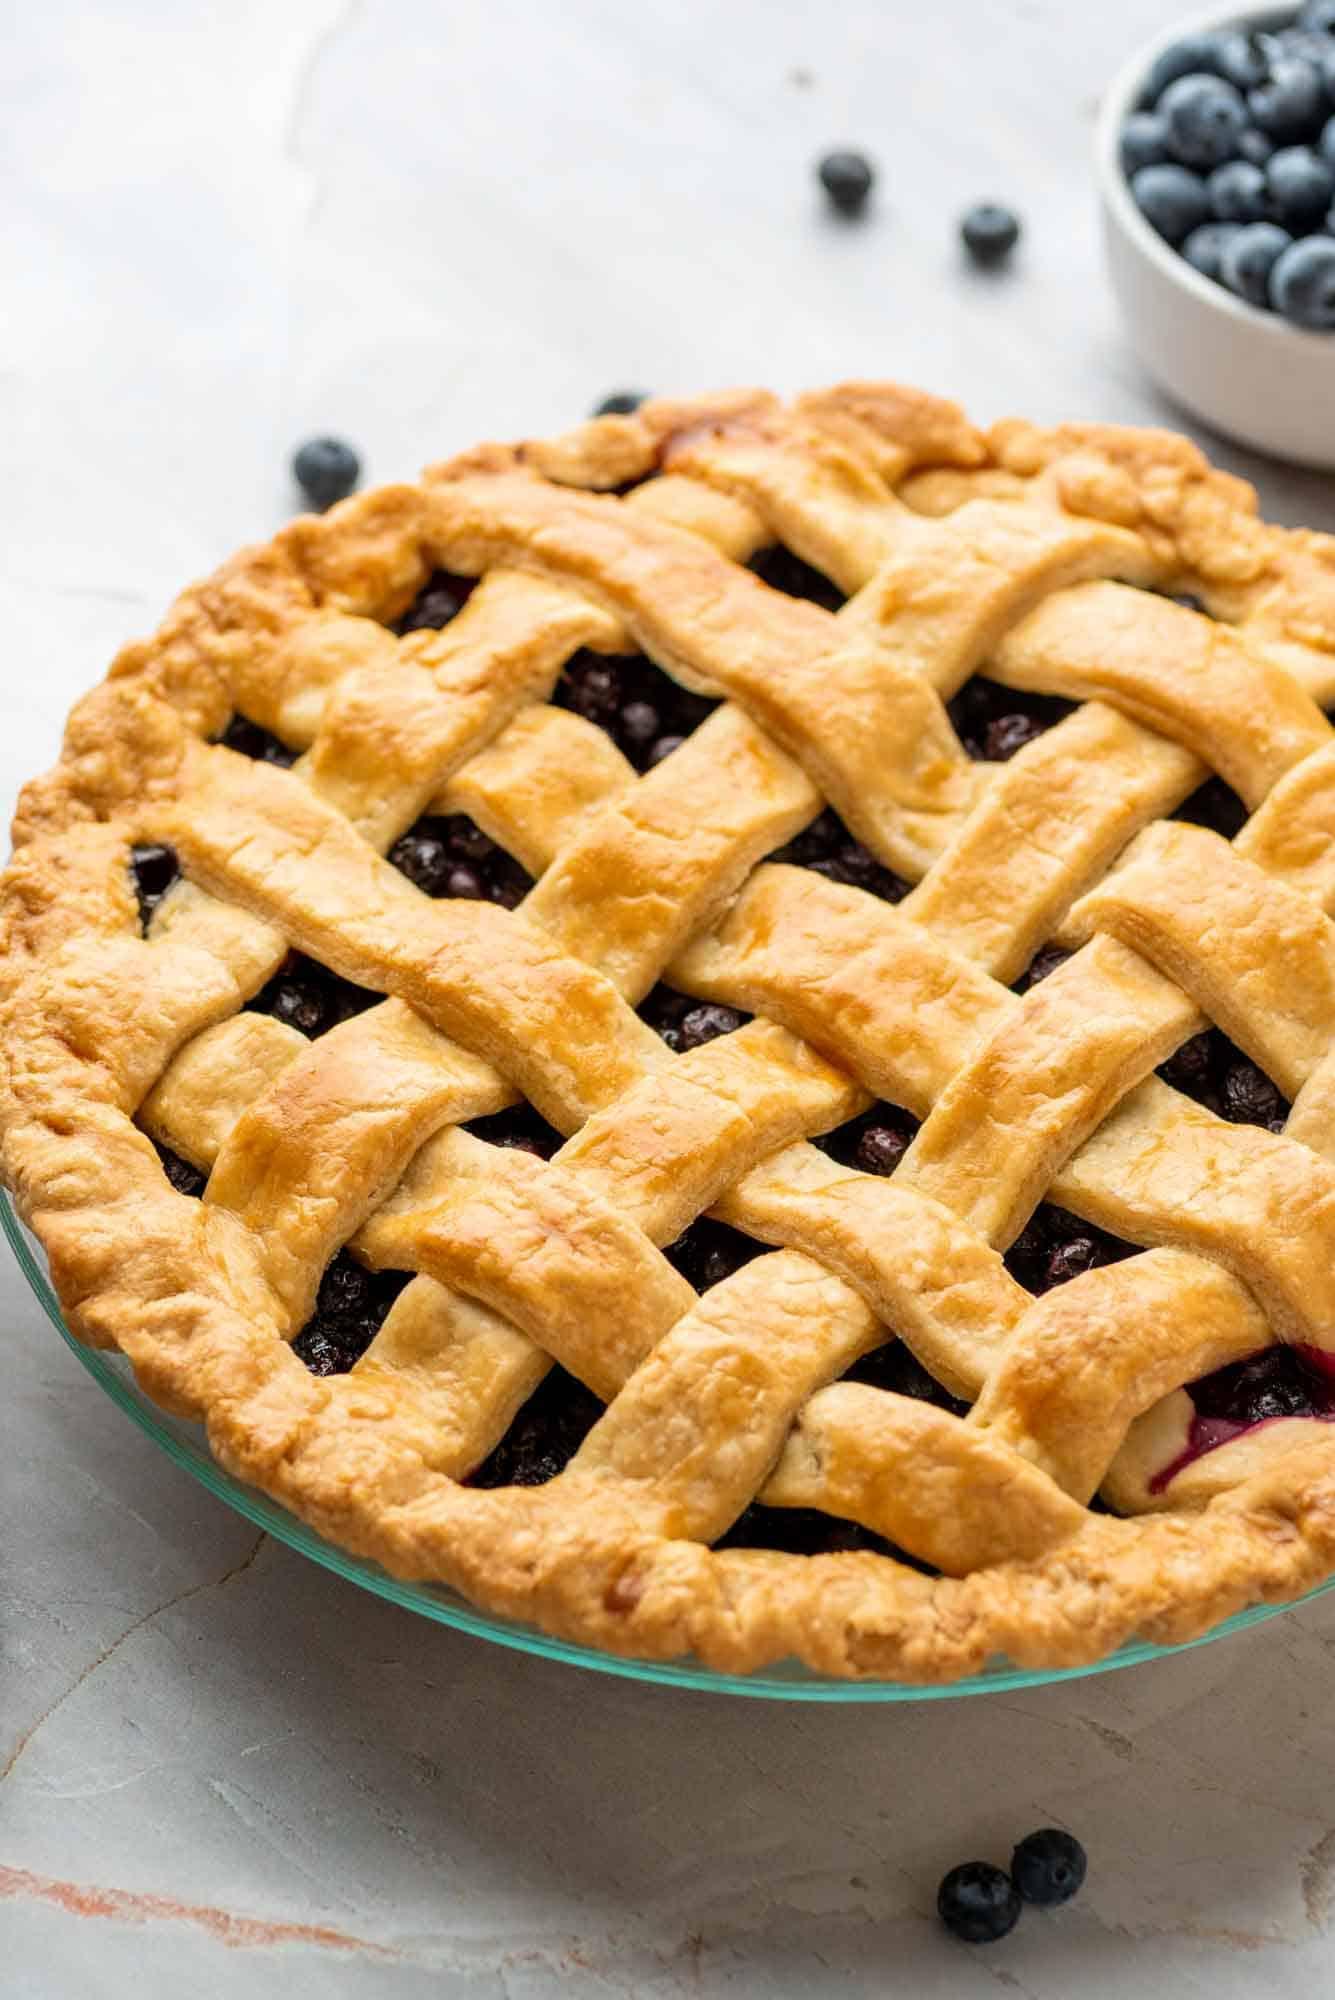 Blueberry pie freshly baked